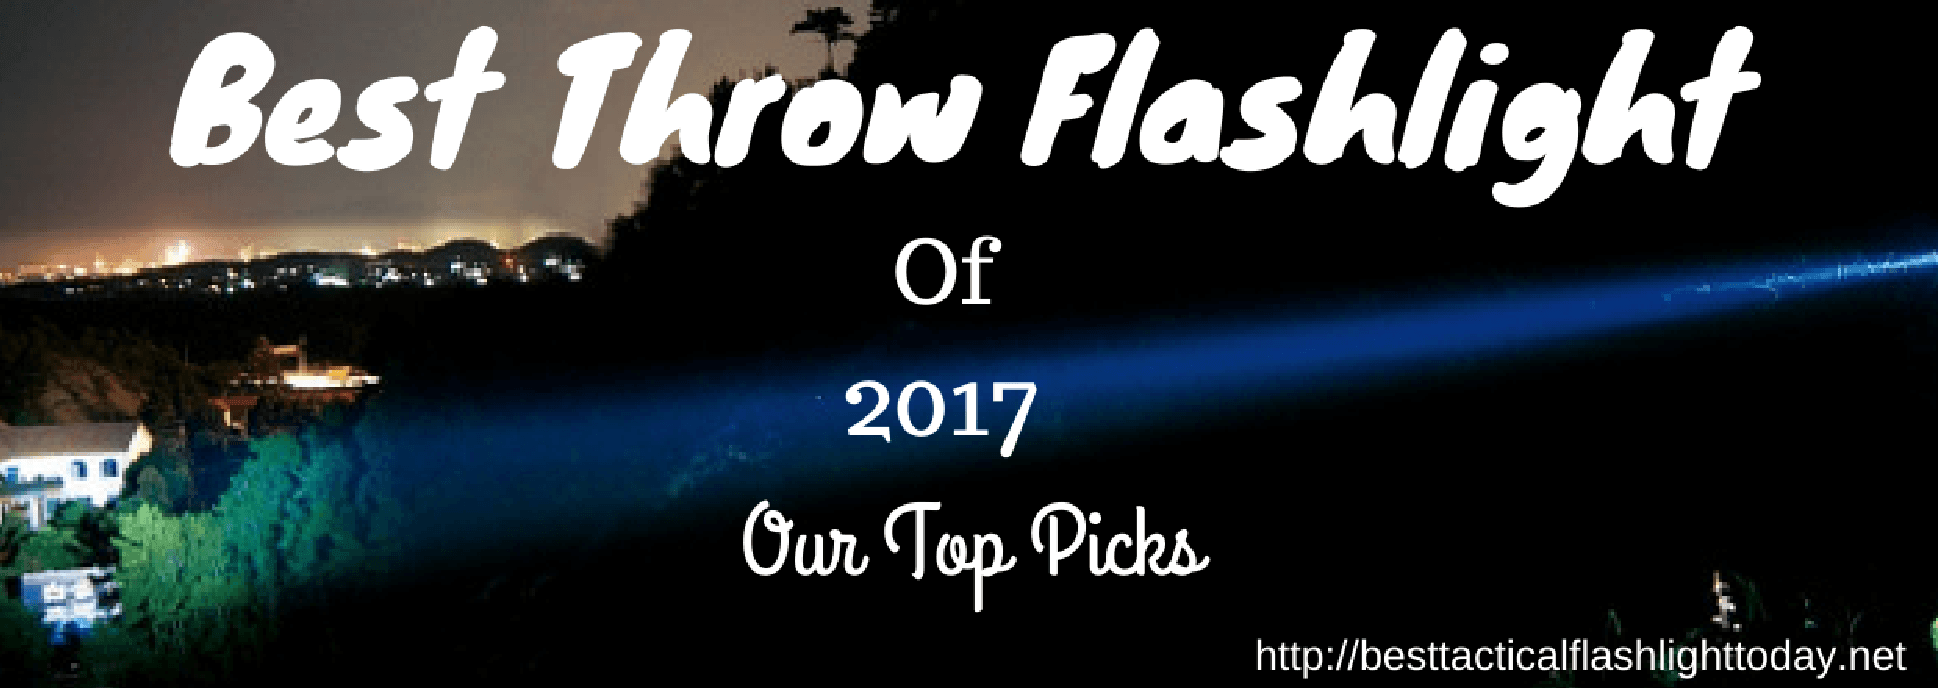 best throw flashlight 2017